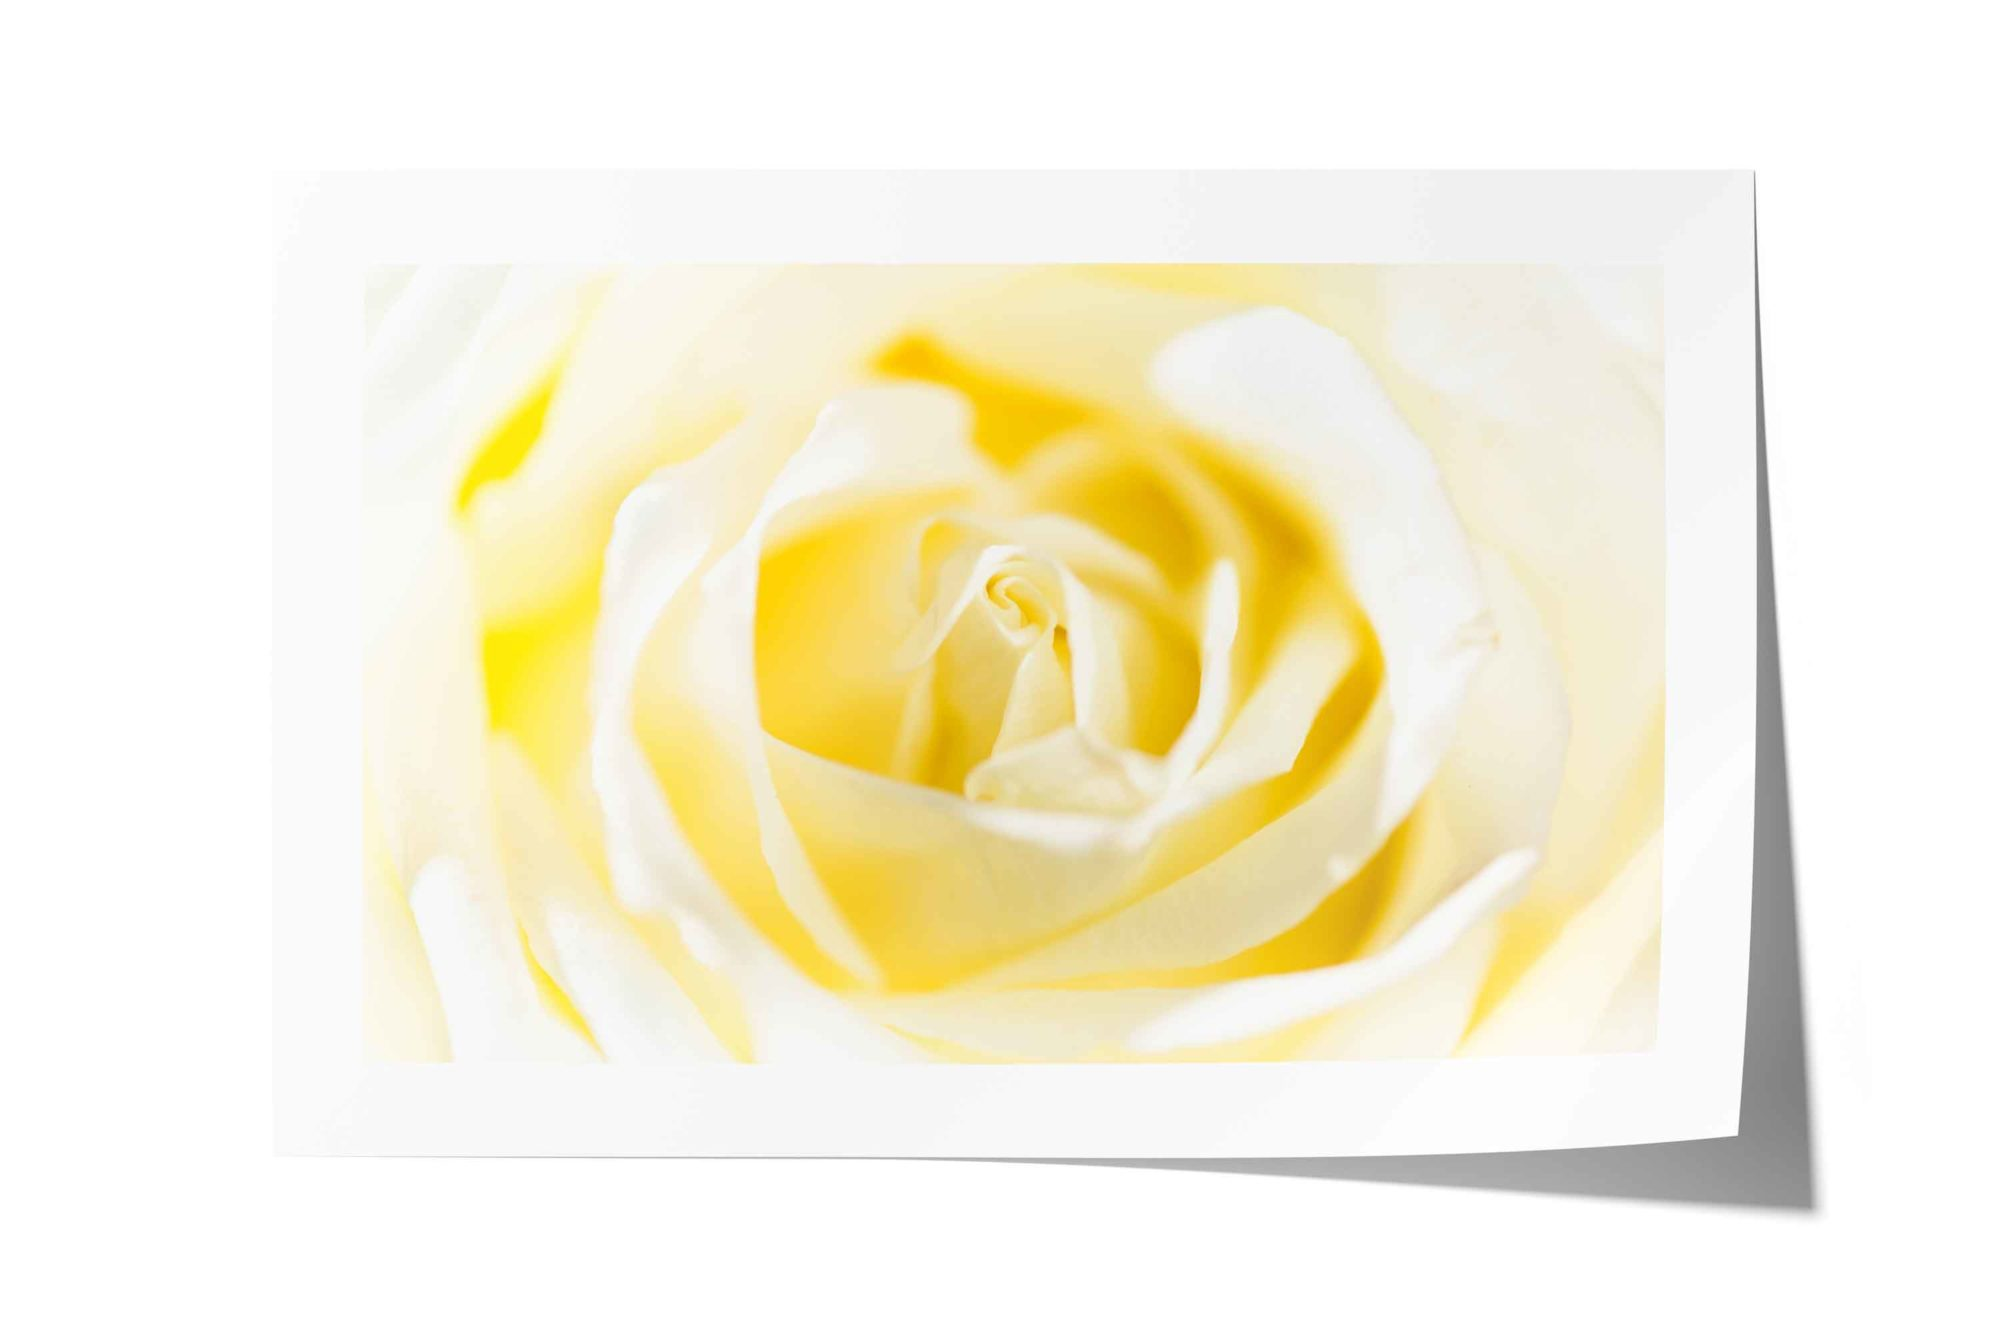 Rose, Flower, Plant, Wedding, Bloom, Blossom, Fresh, Love, Romantic, Macro, Closeup, Detail, Cream, White,